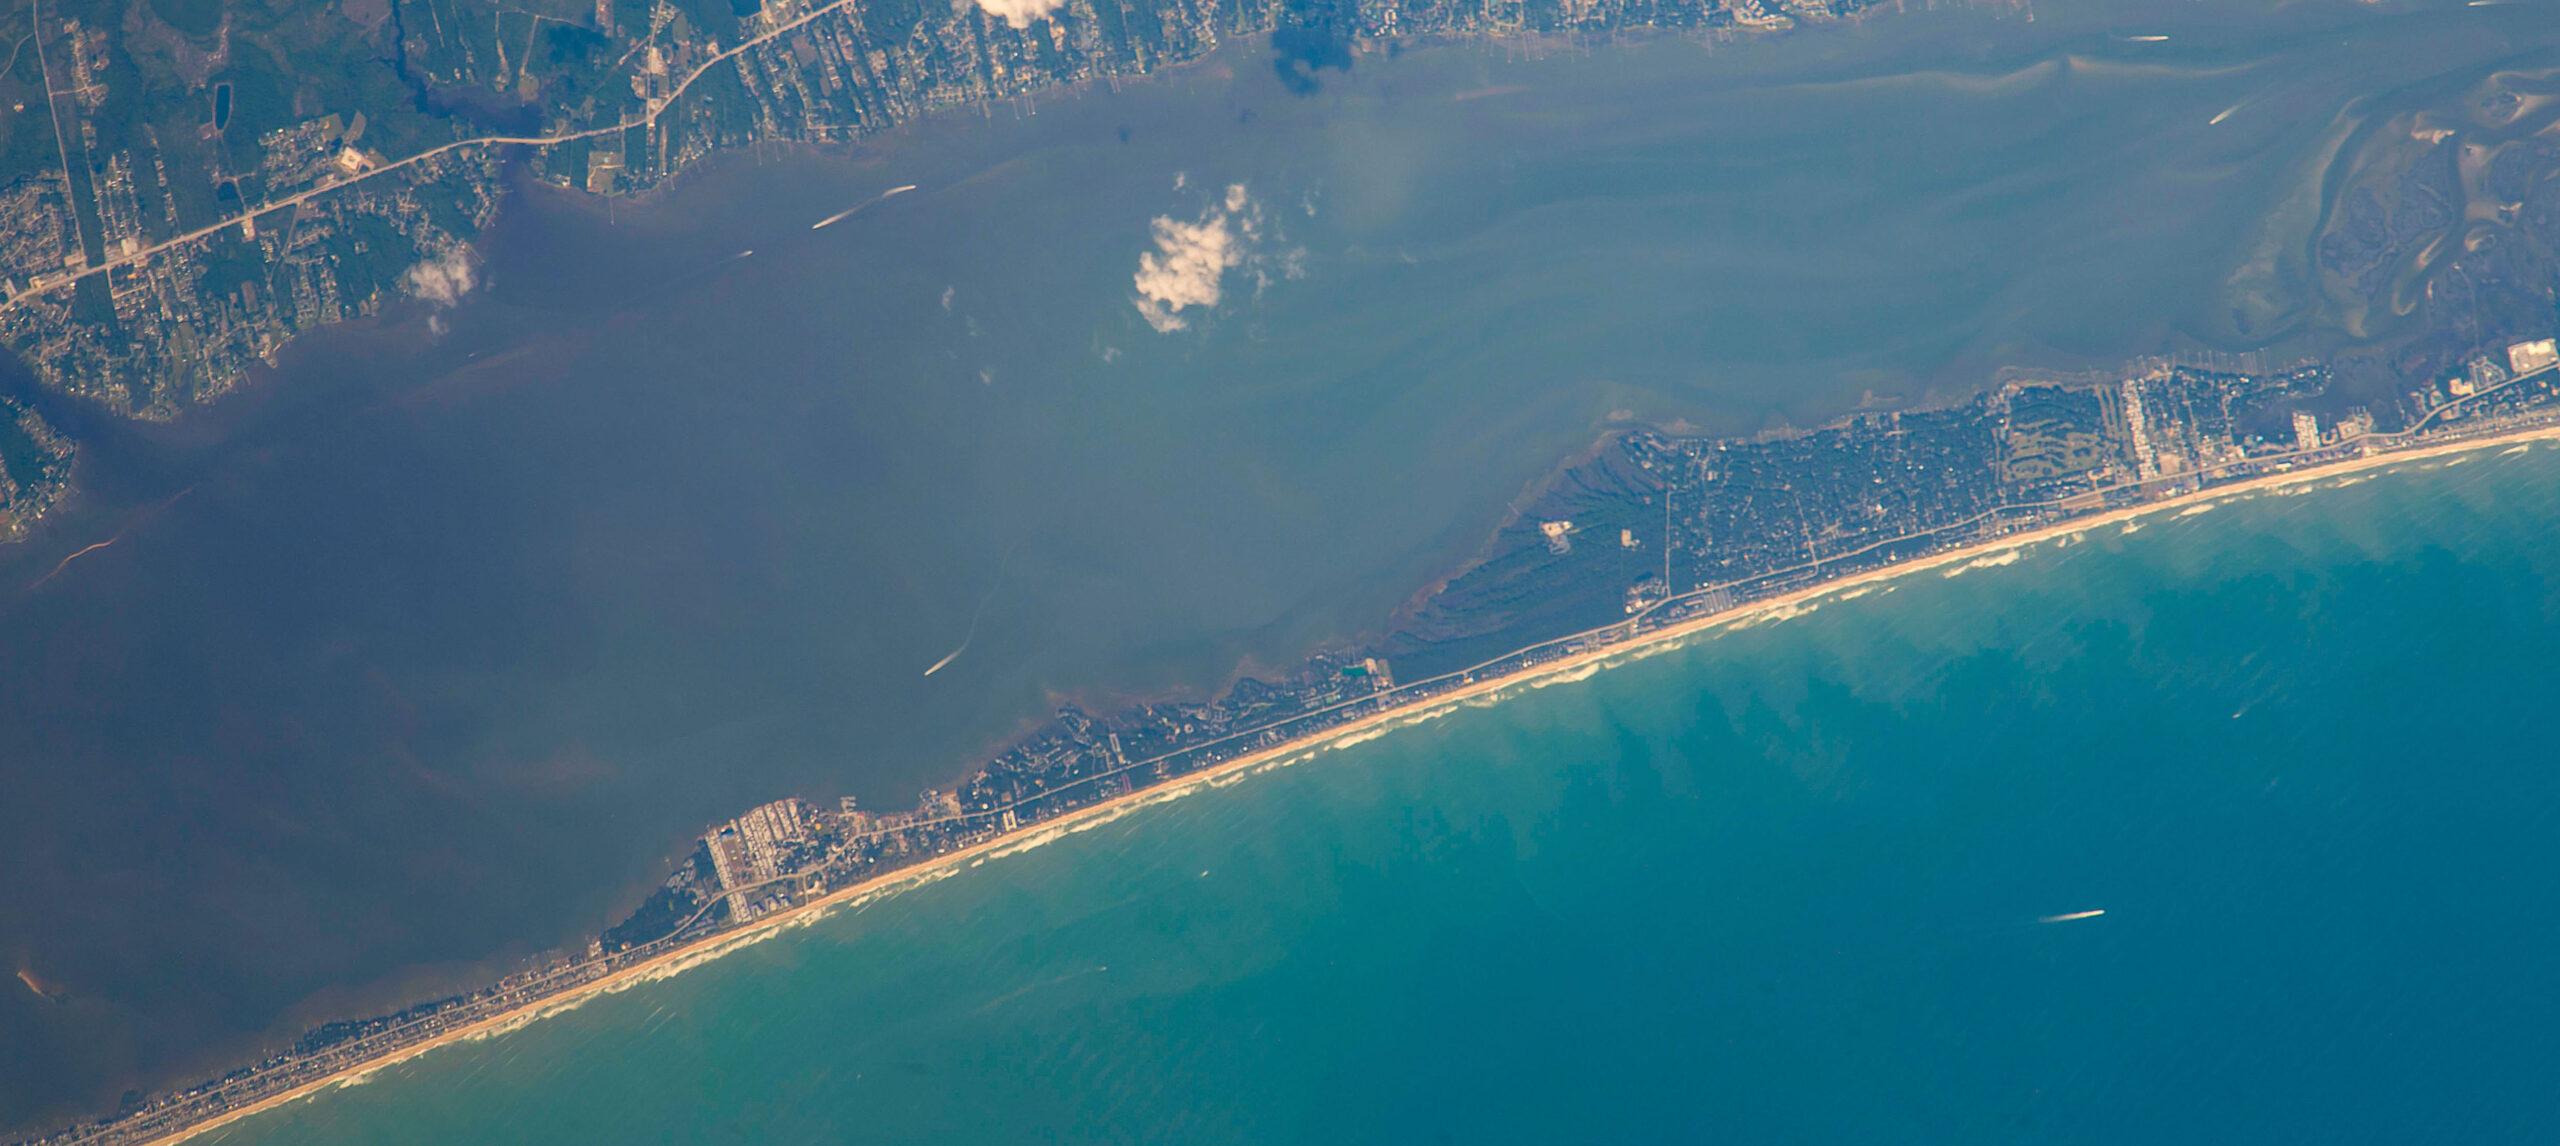 Pine Knoll Shores, site of Alex K. Manda's latest work. Credit: ISS/NASA.